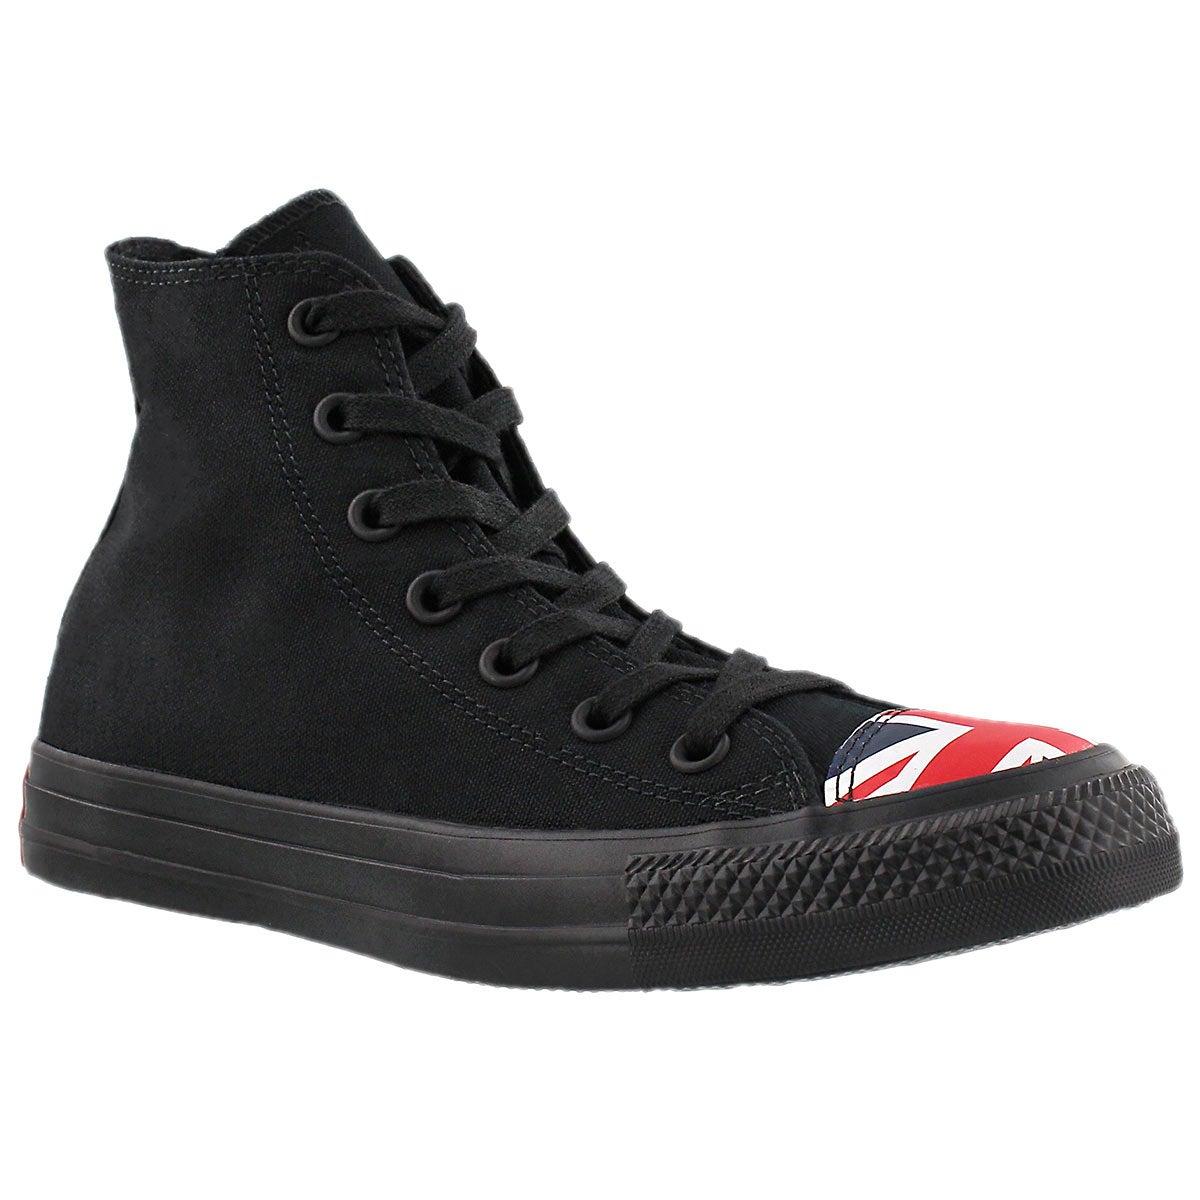 Lds CT All Star UK Flag black hi top